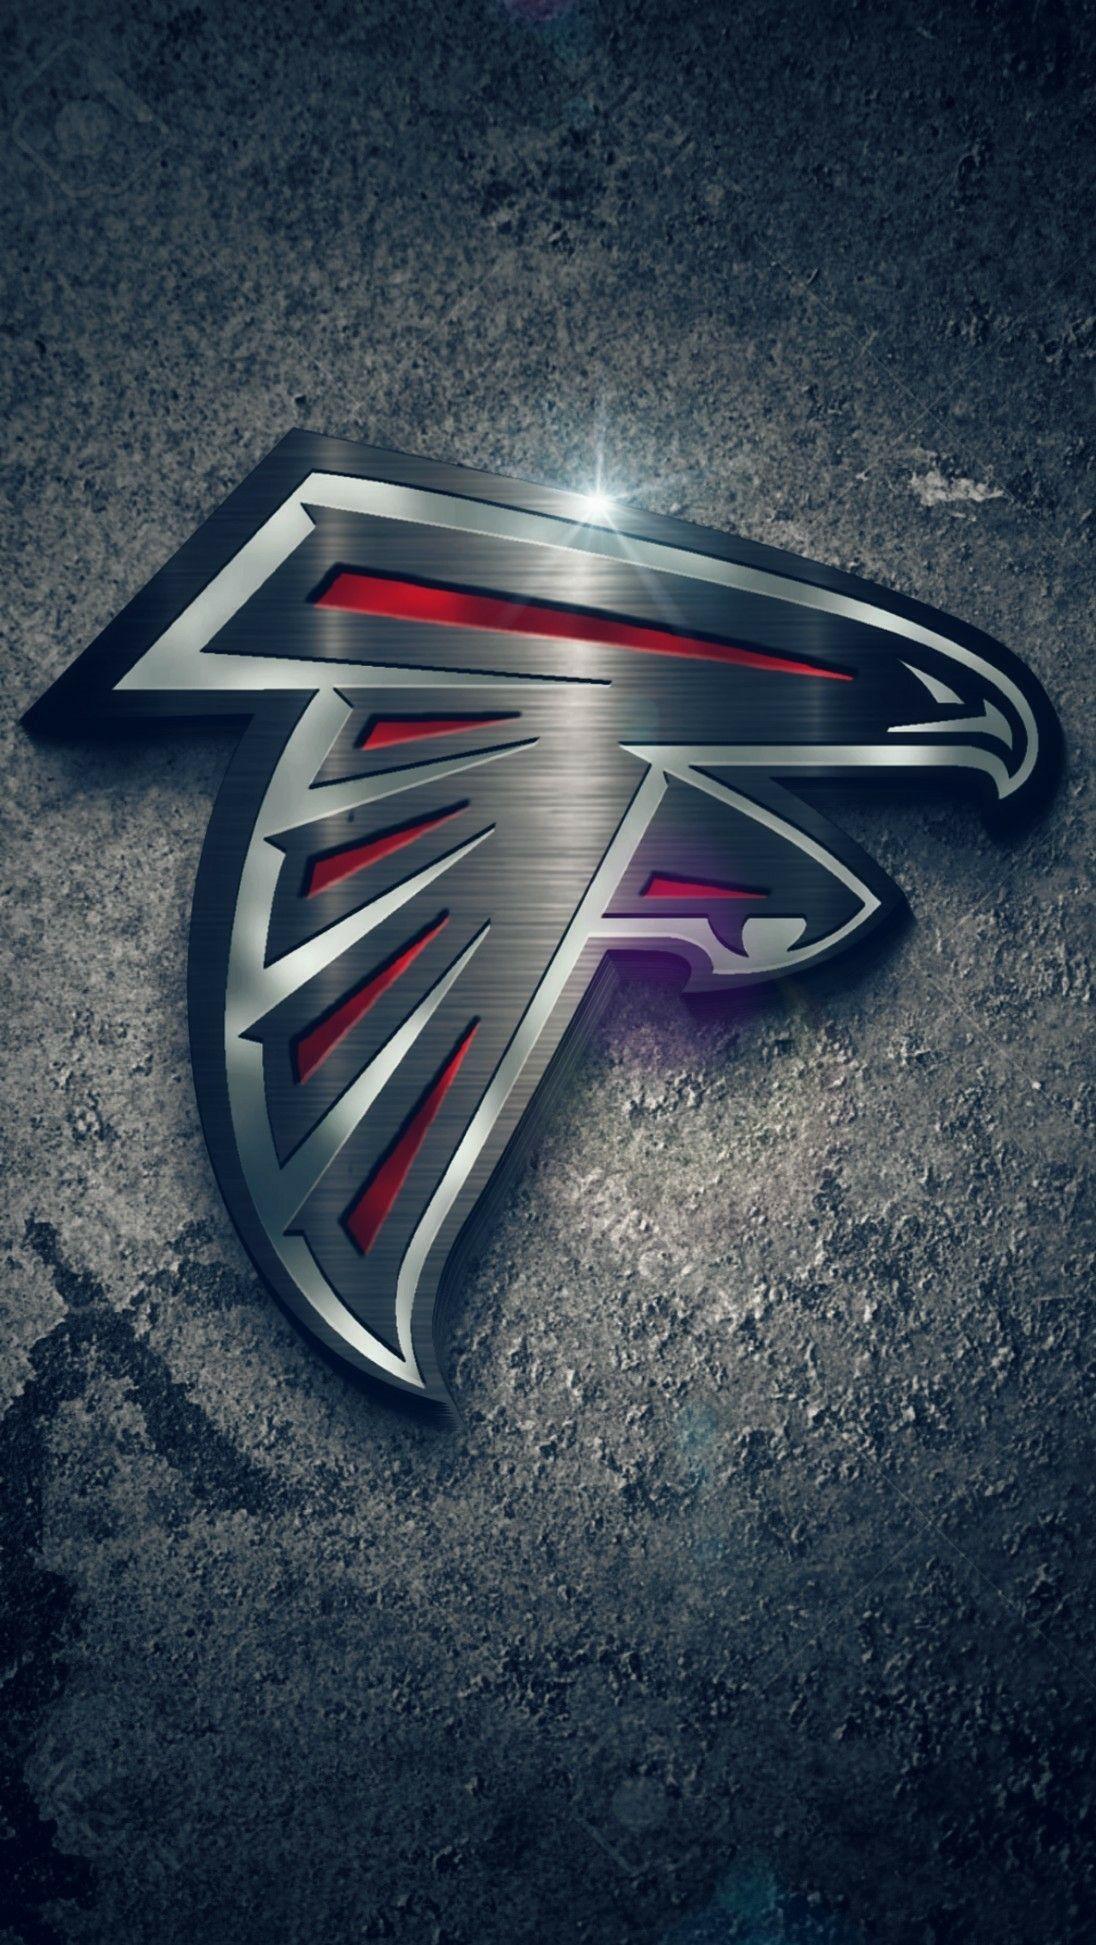 Images About Atlanta Falcons Matt Ryan On Pinterest 640 960 Atlanta Falcon Wallpapers 39 Wallpa Atlanta Falcons Logo Atlanta Falcons Wallpaper Atlanta Falcons